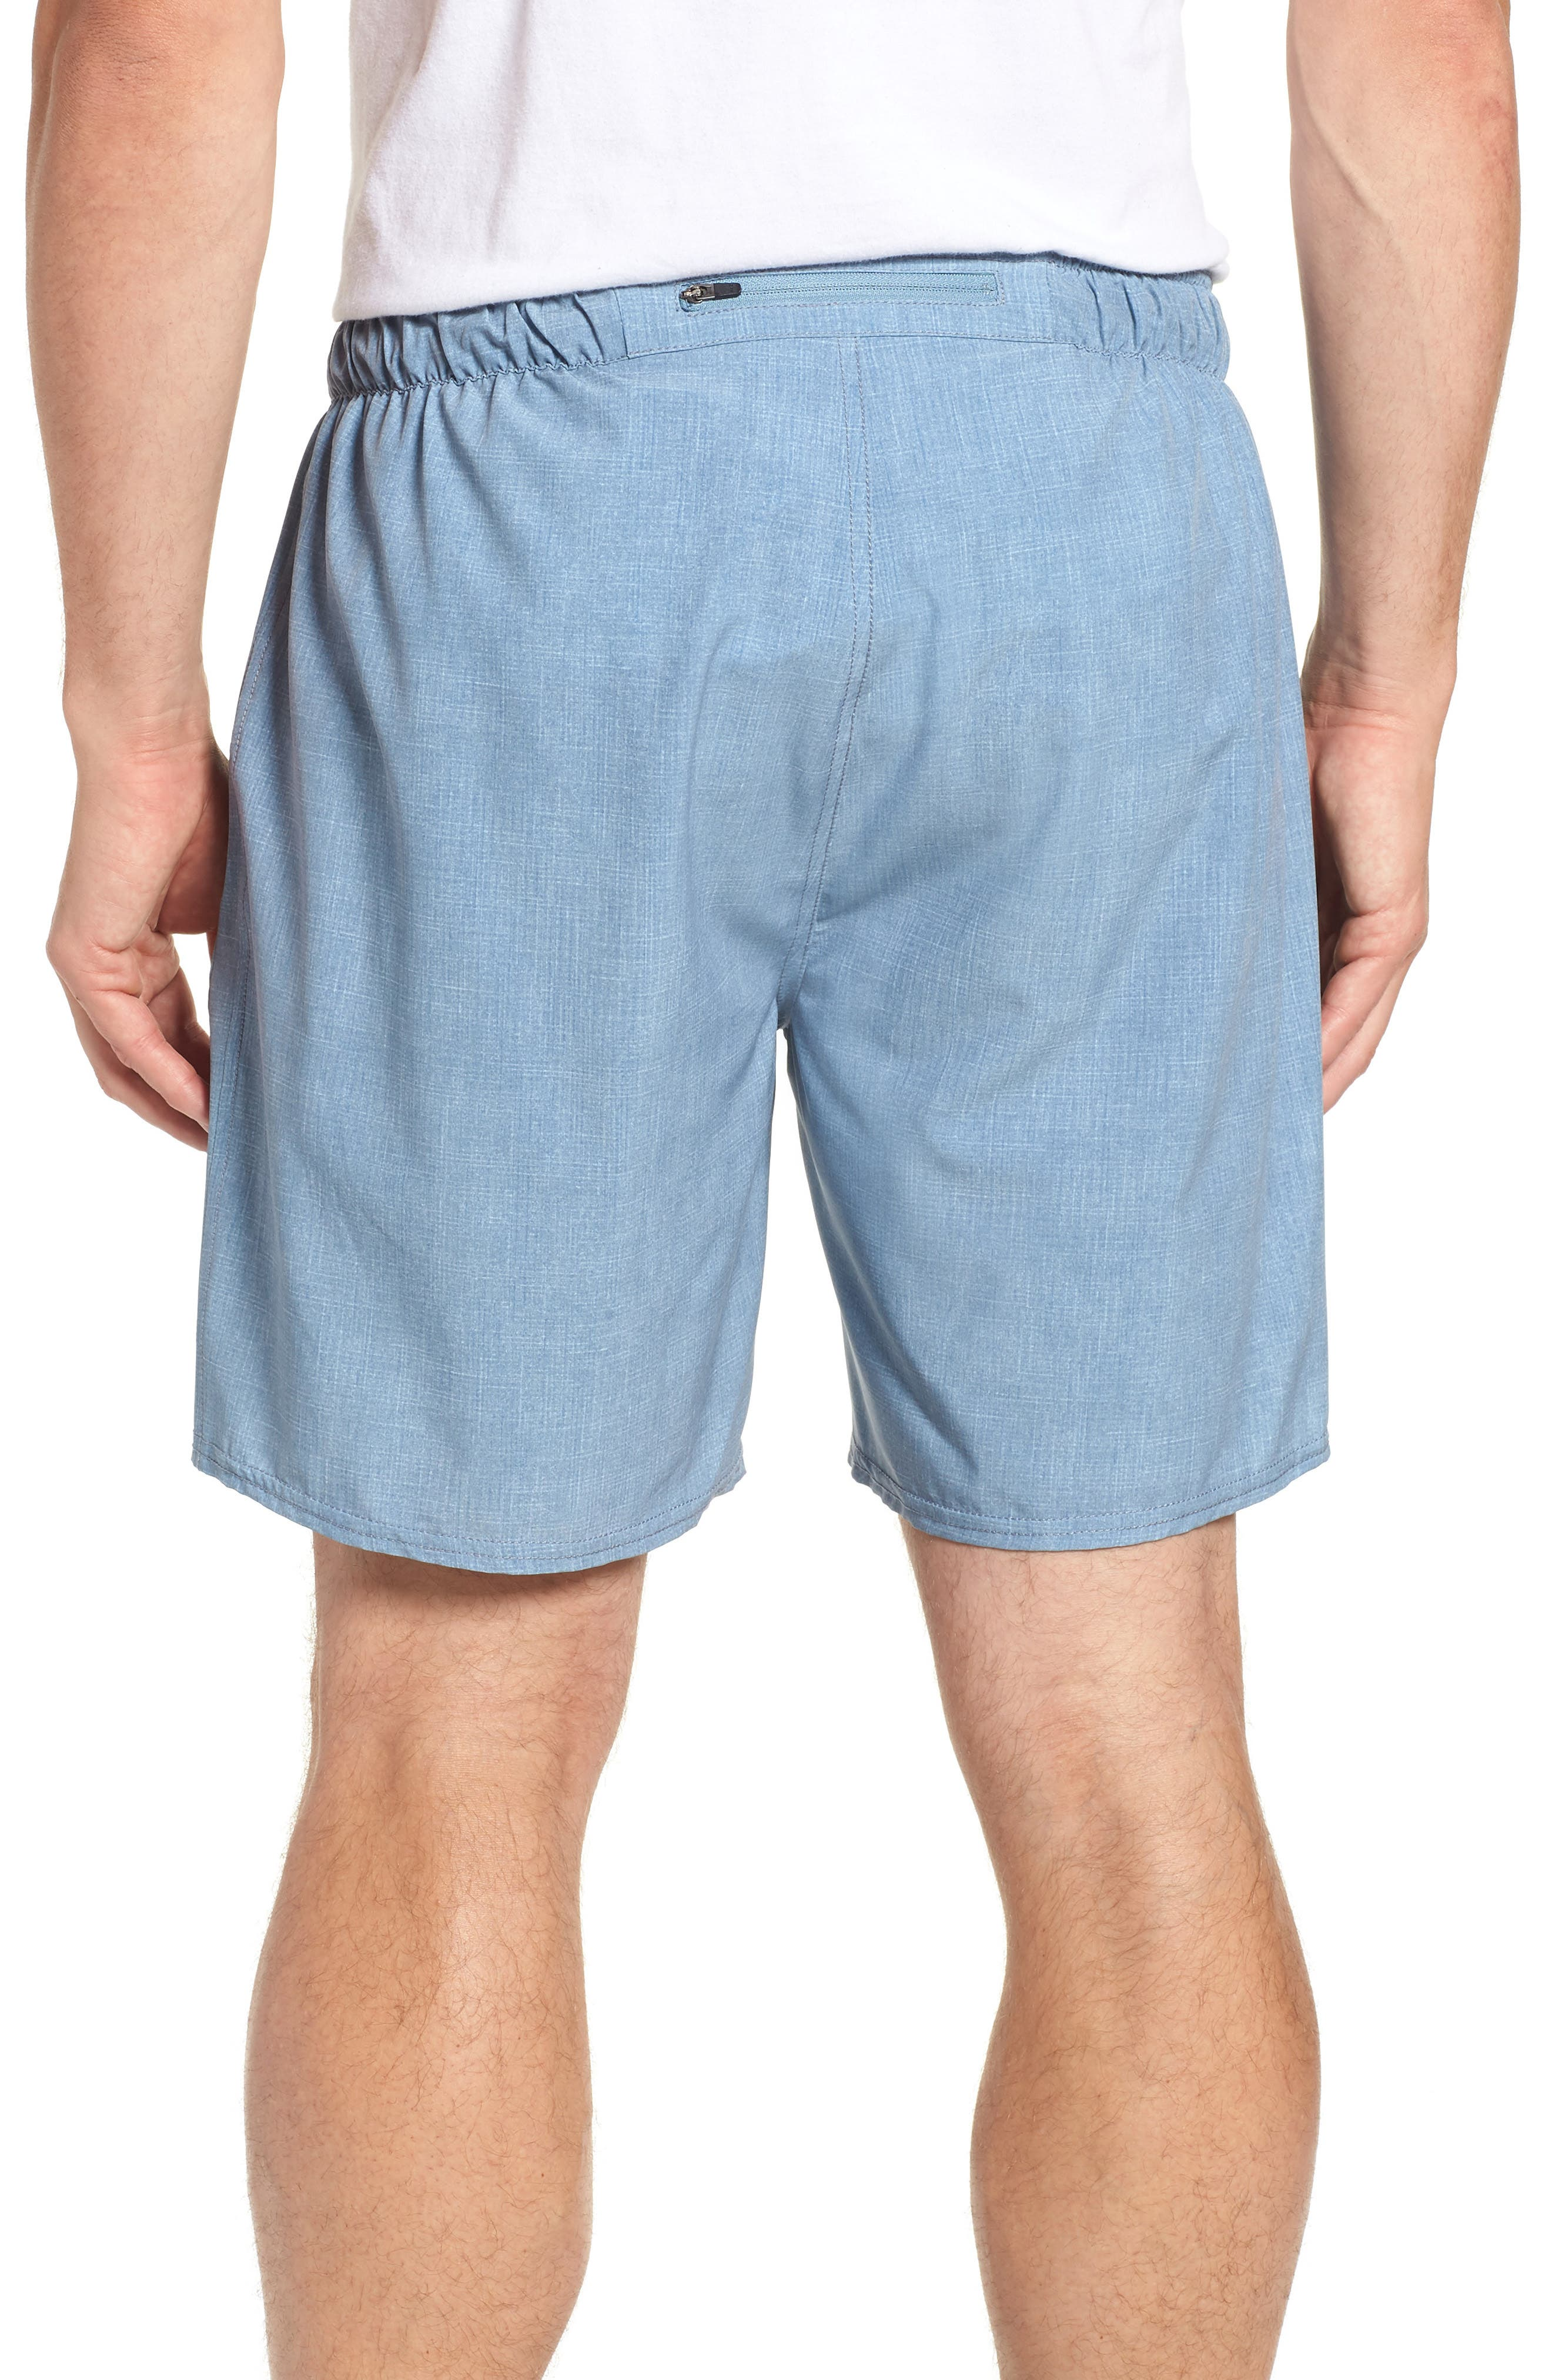 Digits Shorts,                             Alternate thumbnail 2, color,                             HEATHER SHARKSKIN